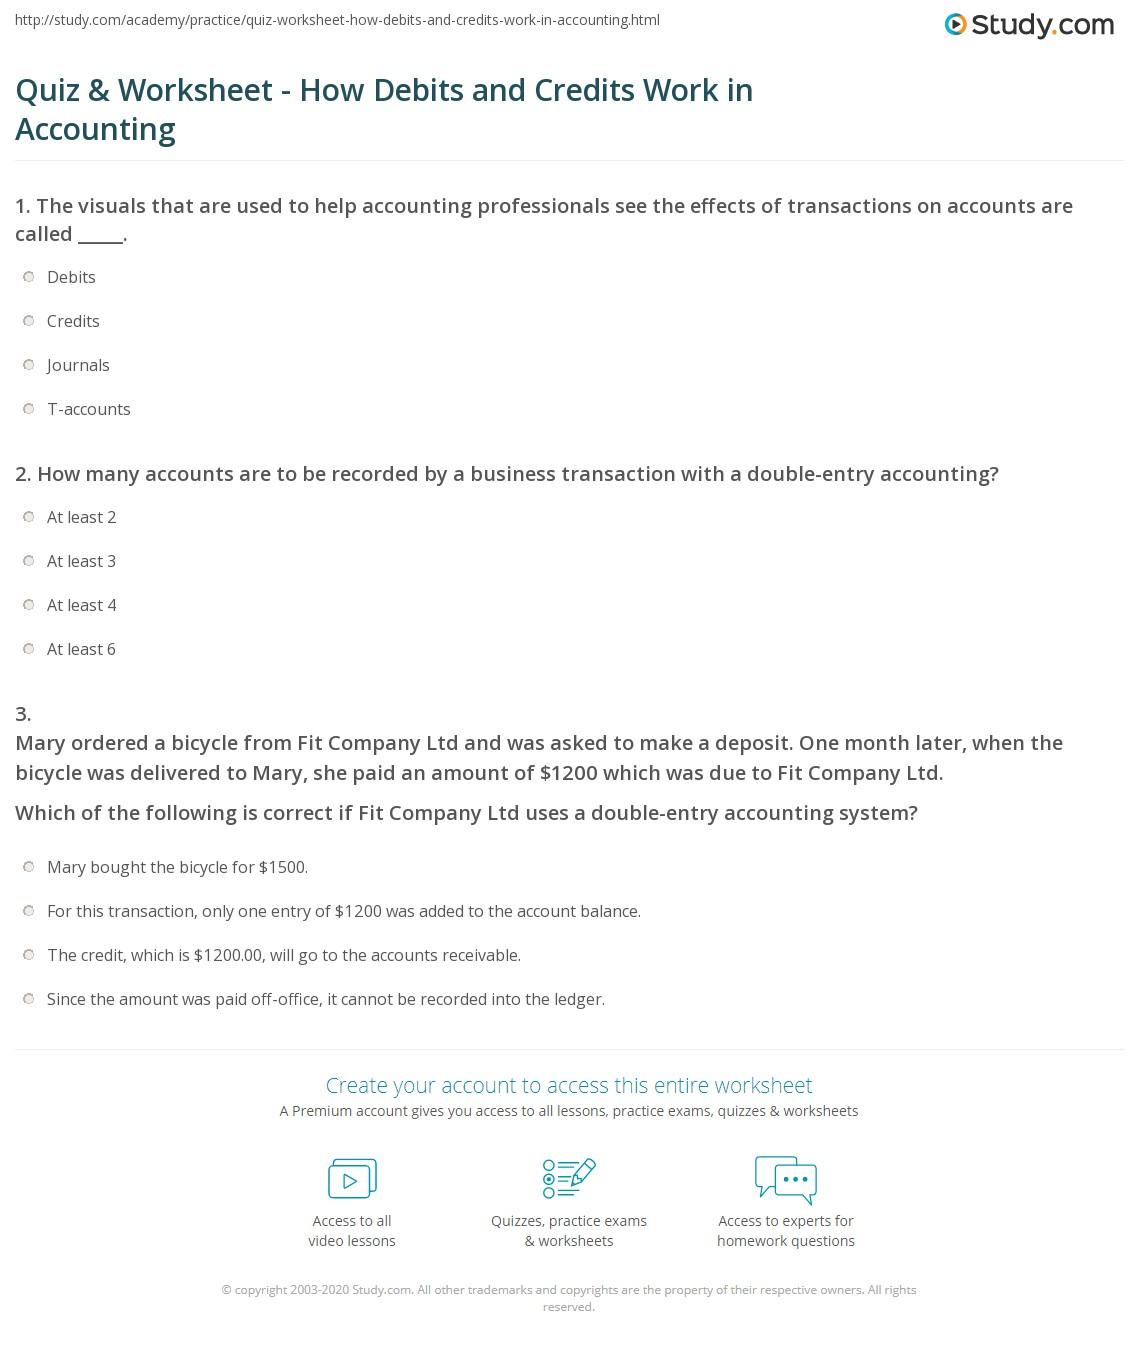 worksheet Accounting Worksheets quiz worksheet how debits and credits work in accounting print understanding worksheet